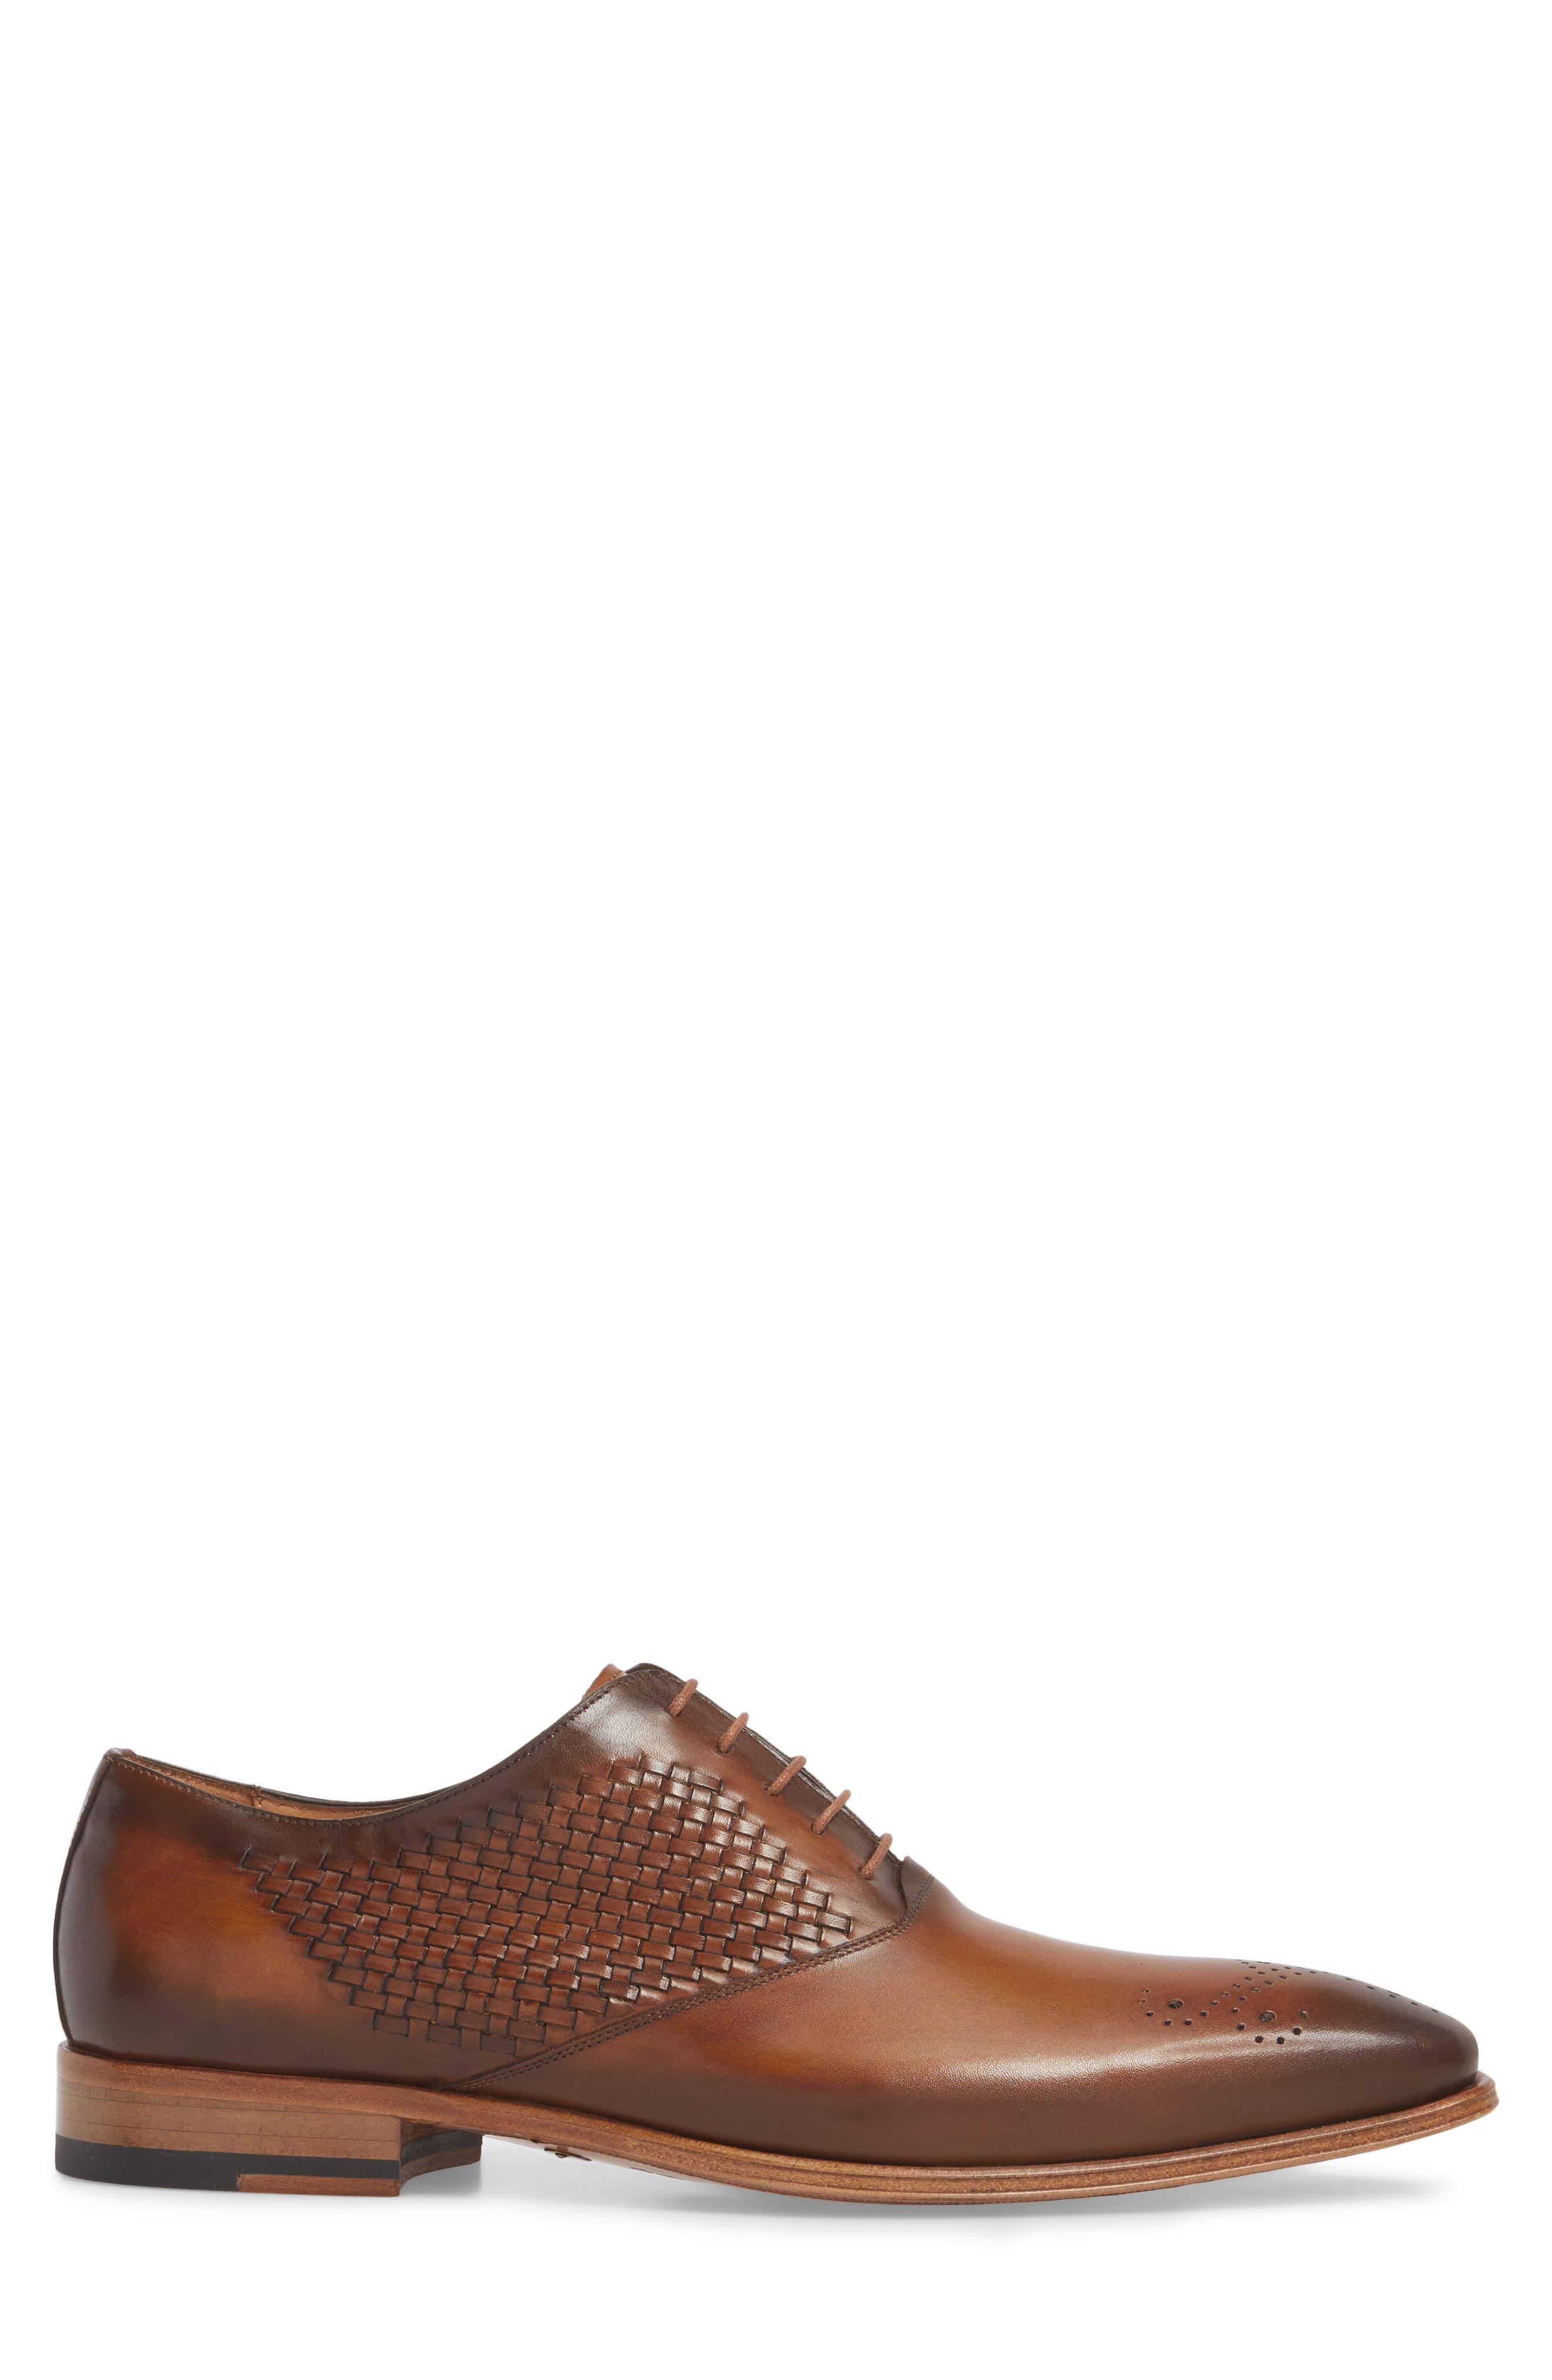 Juventa Woven Oxford,                             Alternate thumbnail 3, color,                             Honey Leather